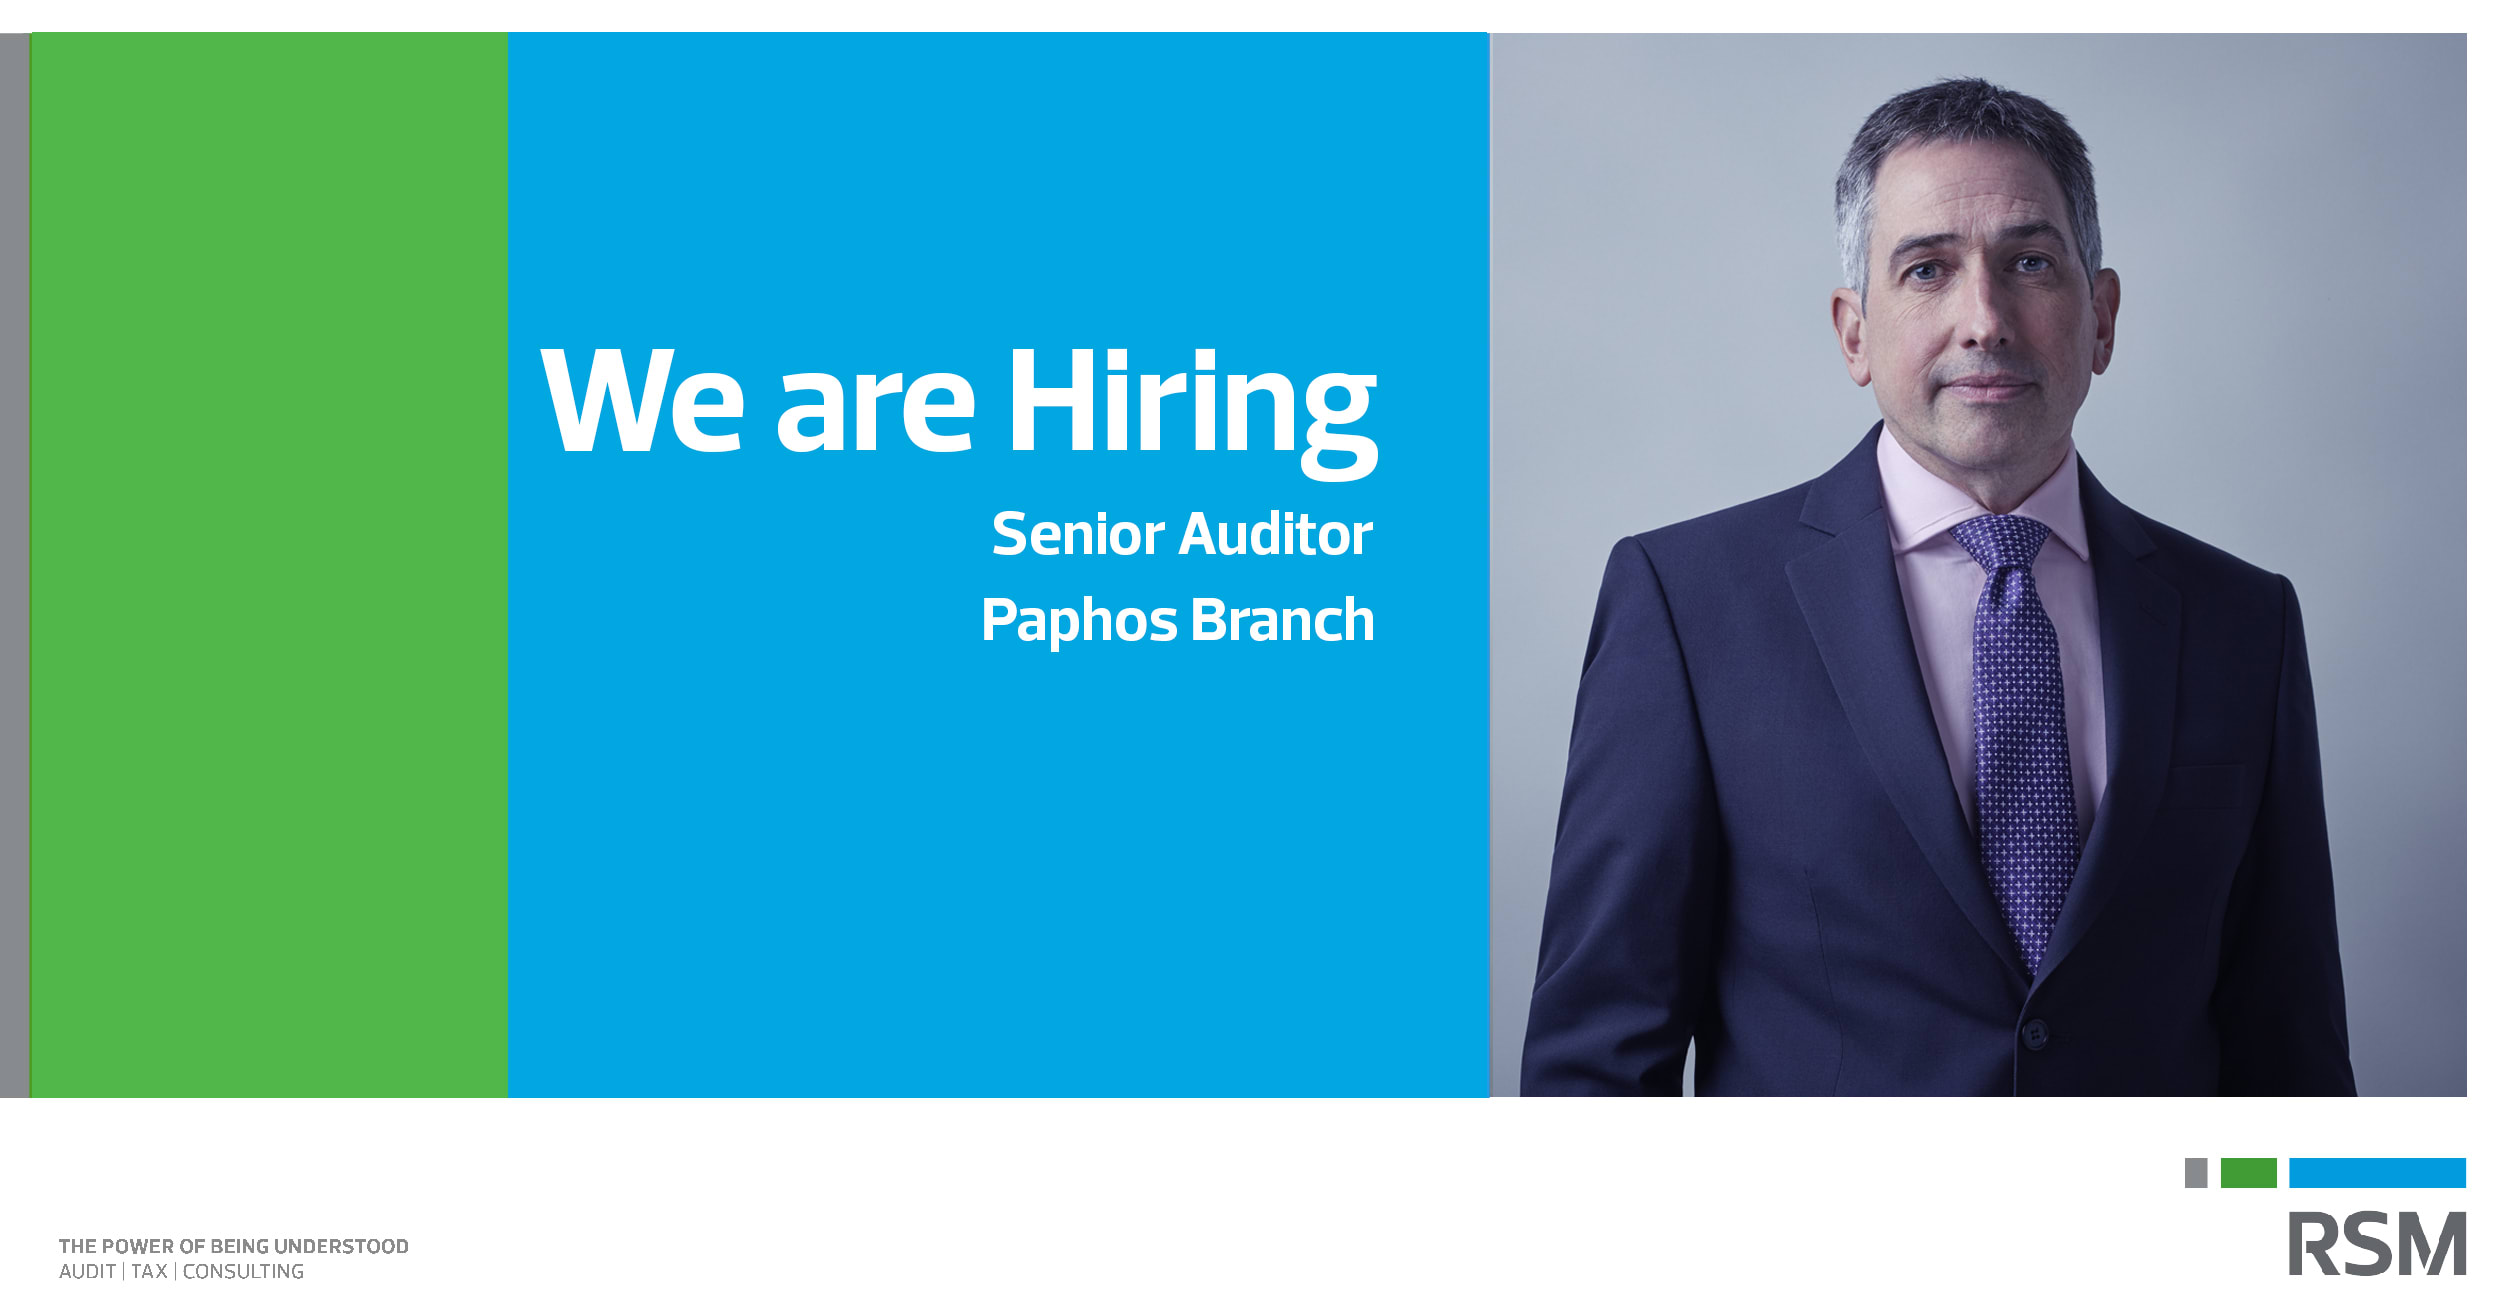 Senior Auditor Paphos Branch